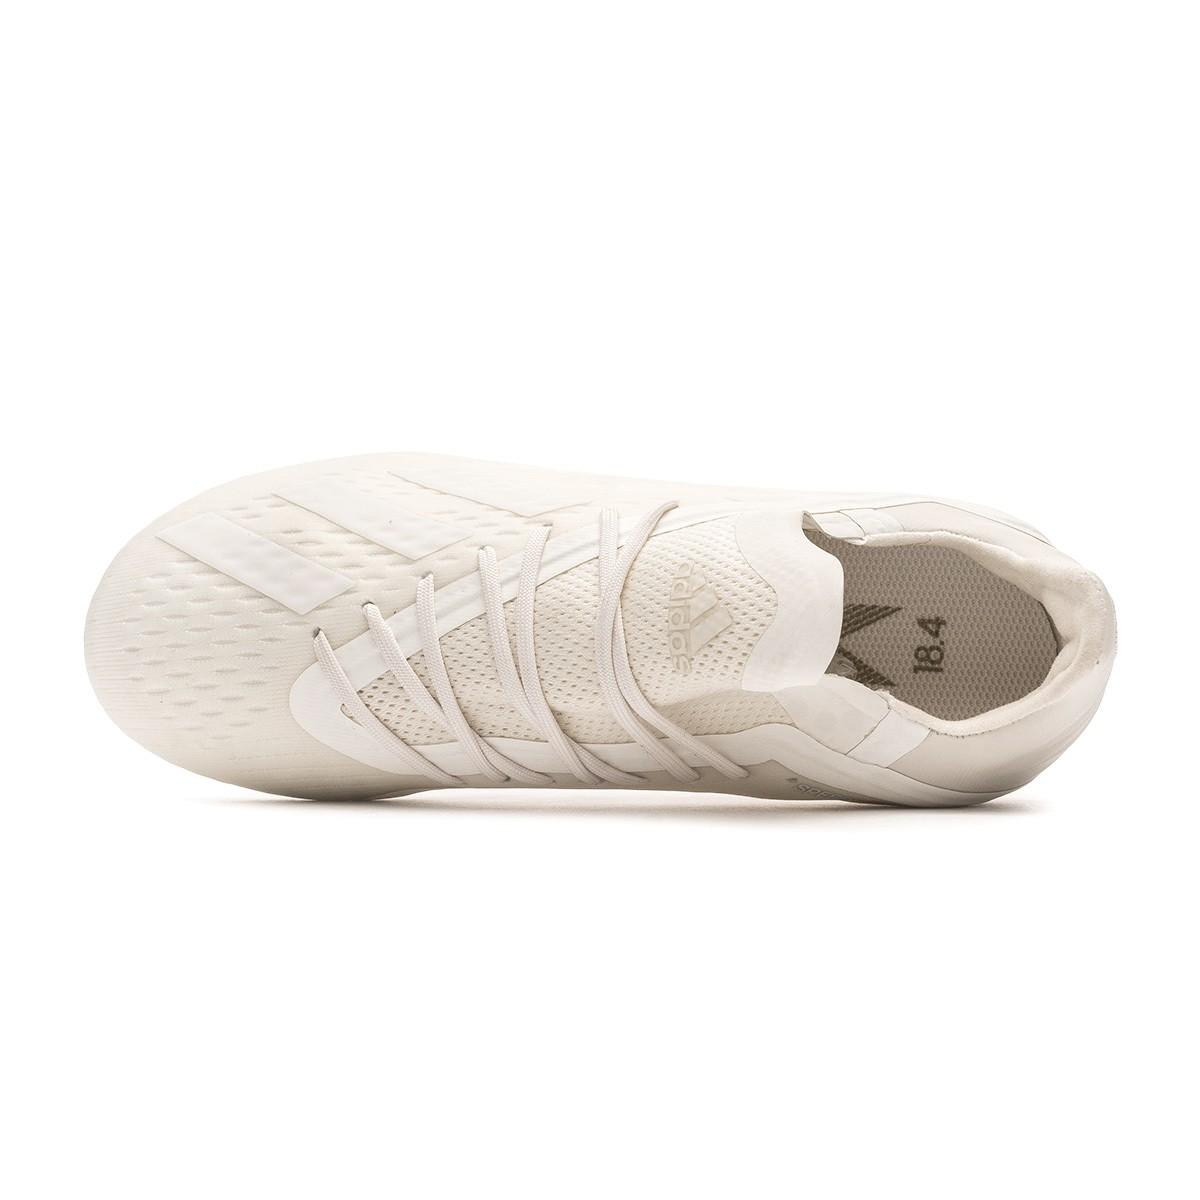 newest 5ee8f 8c78c Football Boots adidas Kids X 18.1 FG Off white-White-Core black - Tienda de  fútbol Fútbol Emotion